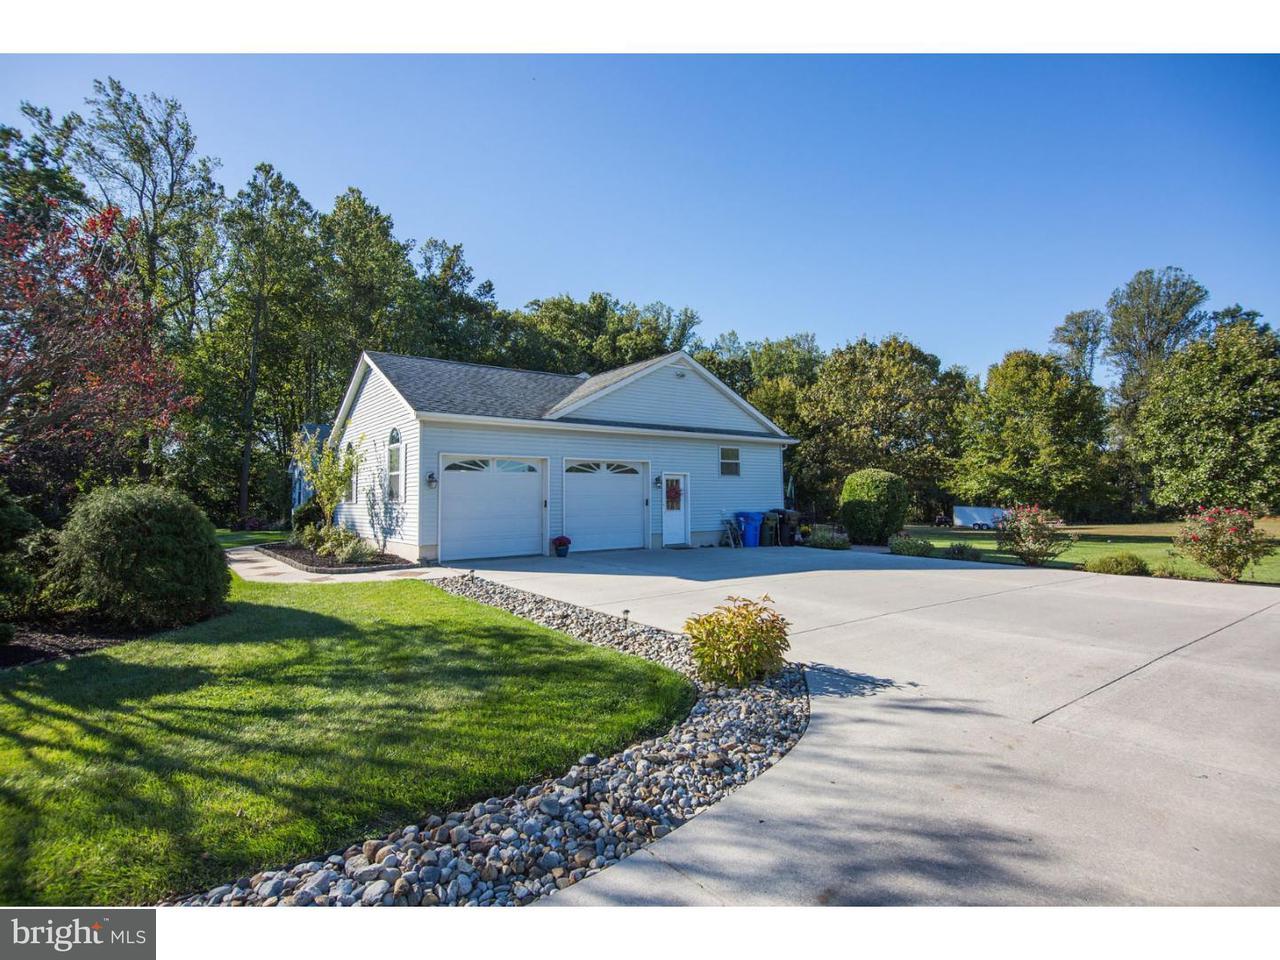 Additional photo for property listing at 1 LARAMIE WAY  Mantua, Nueva Jersey 08051 Estados Unidos